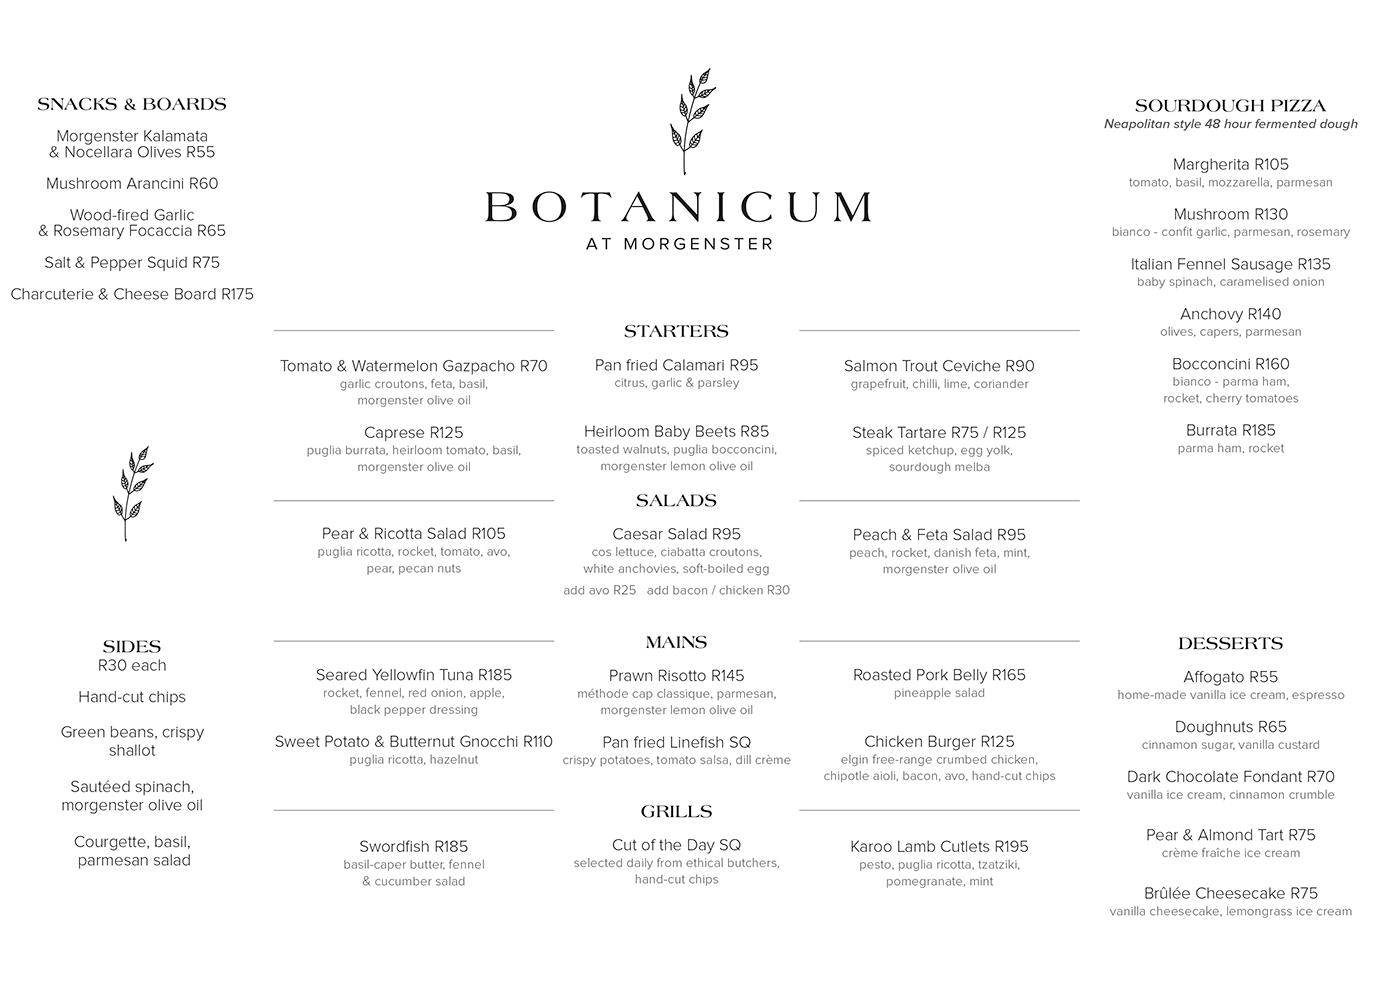 Botanicum Morgenster - Main Menu 10-12-2020